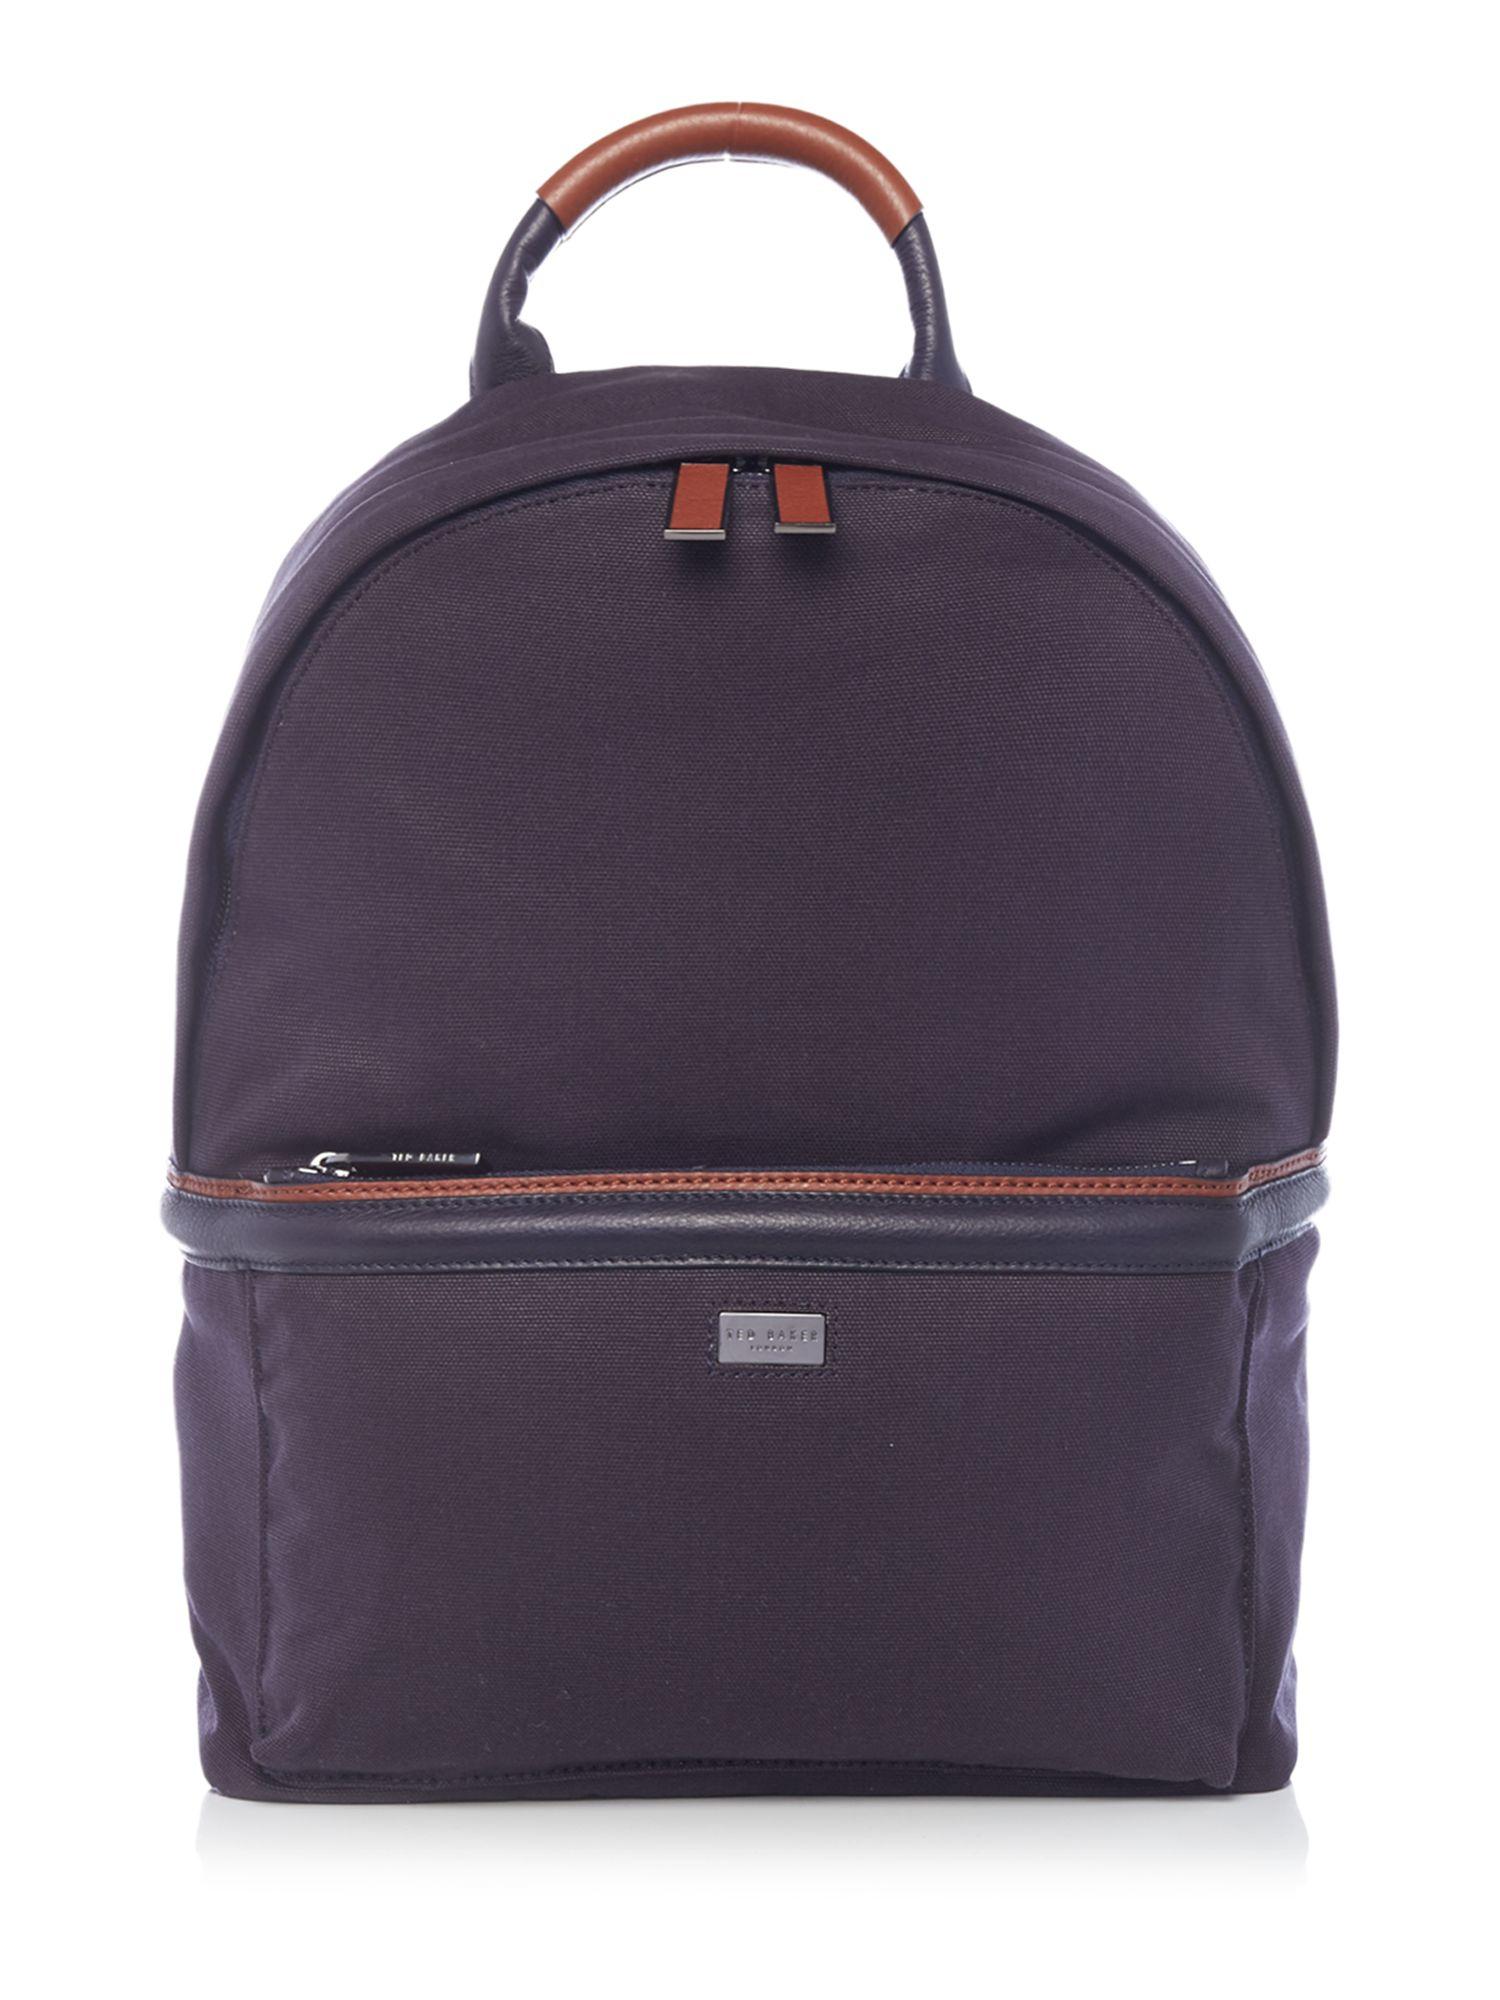 ted baker canvas and leather backpack in blue for men lyst. Black Bedroom Furniture Sets. Home Design Ideas